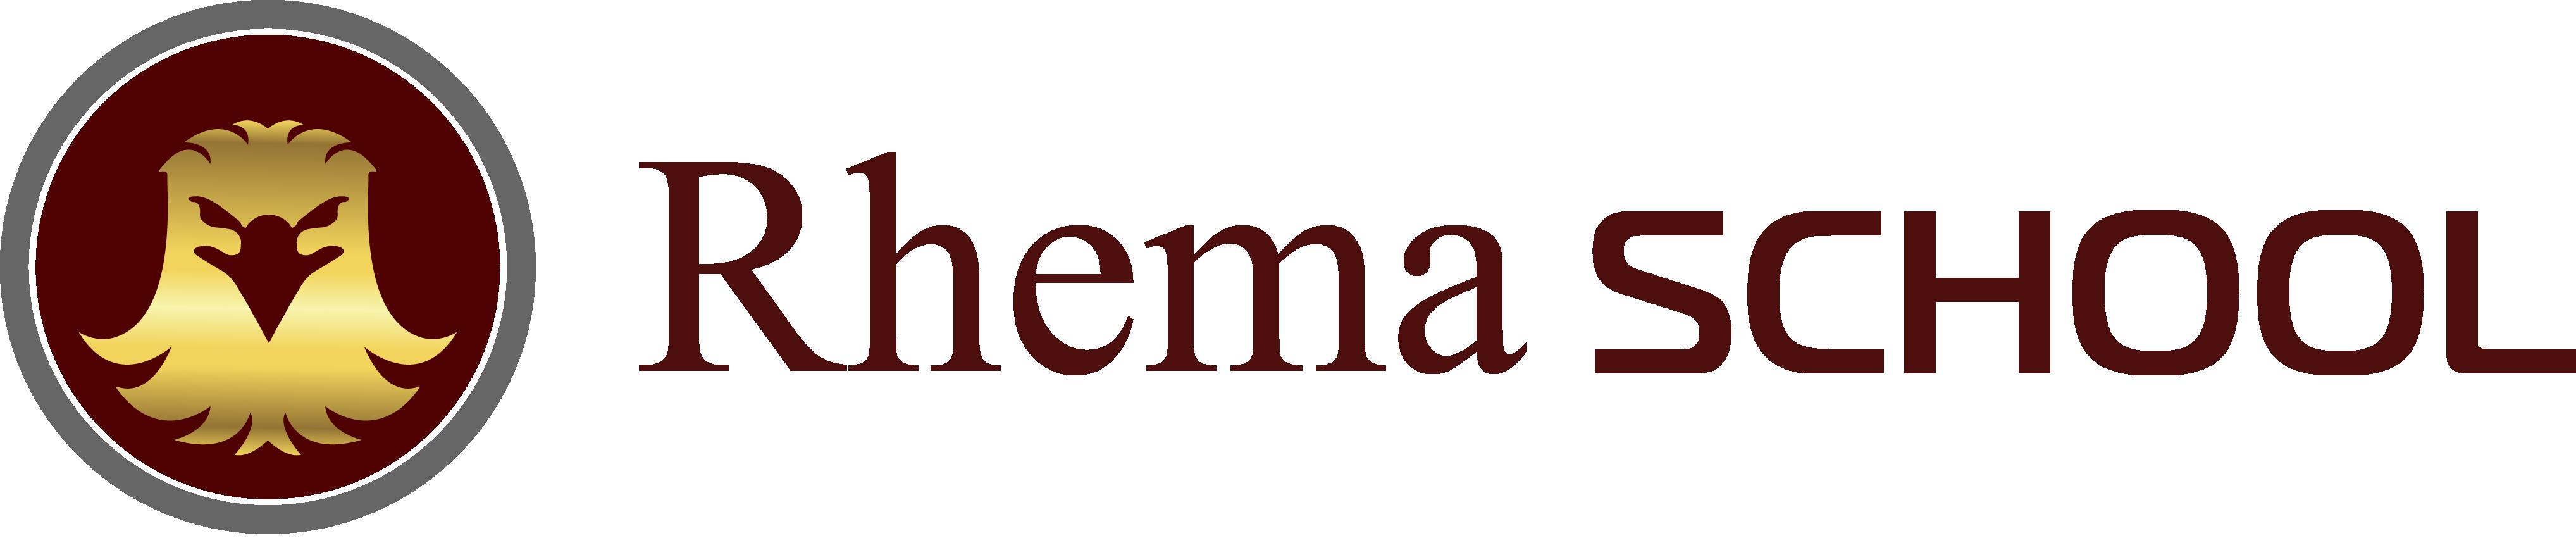 Rhema School